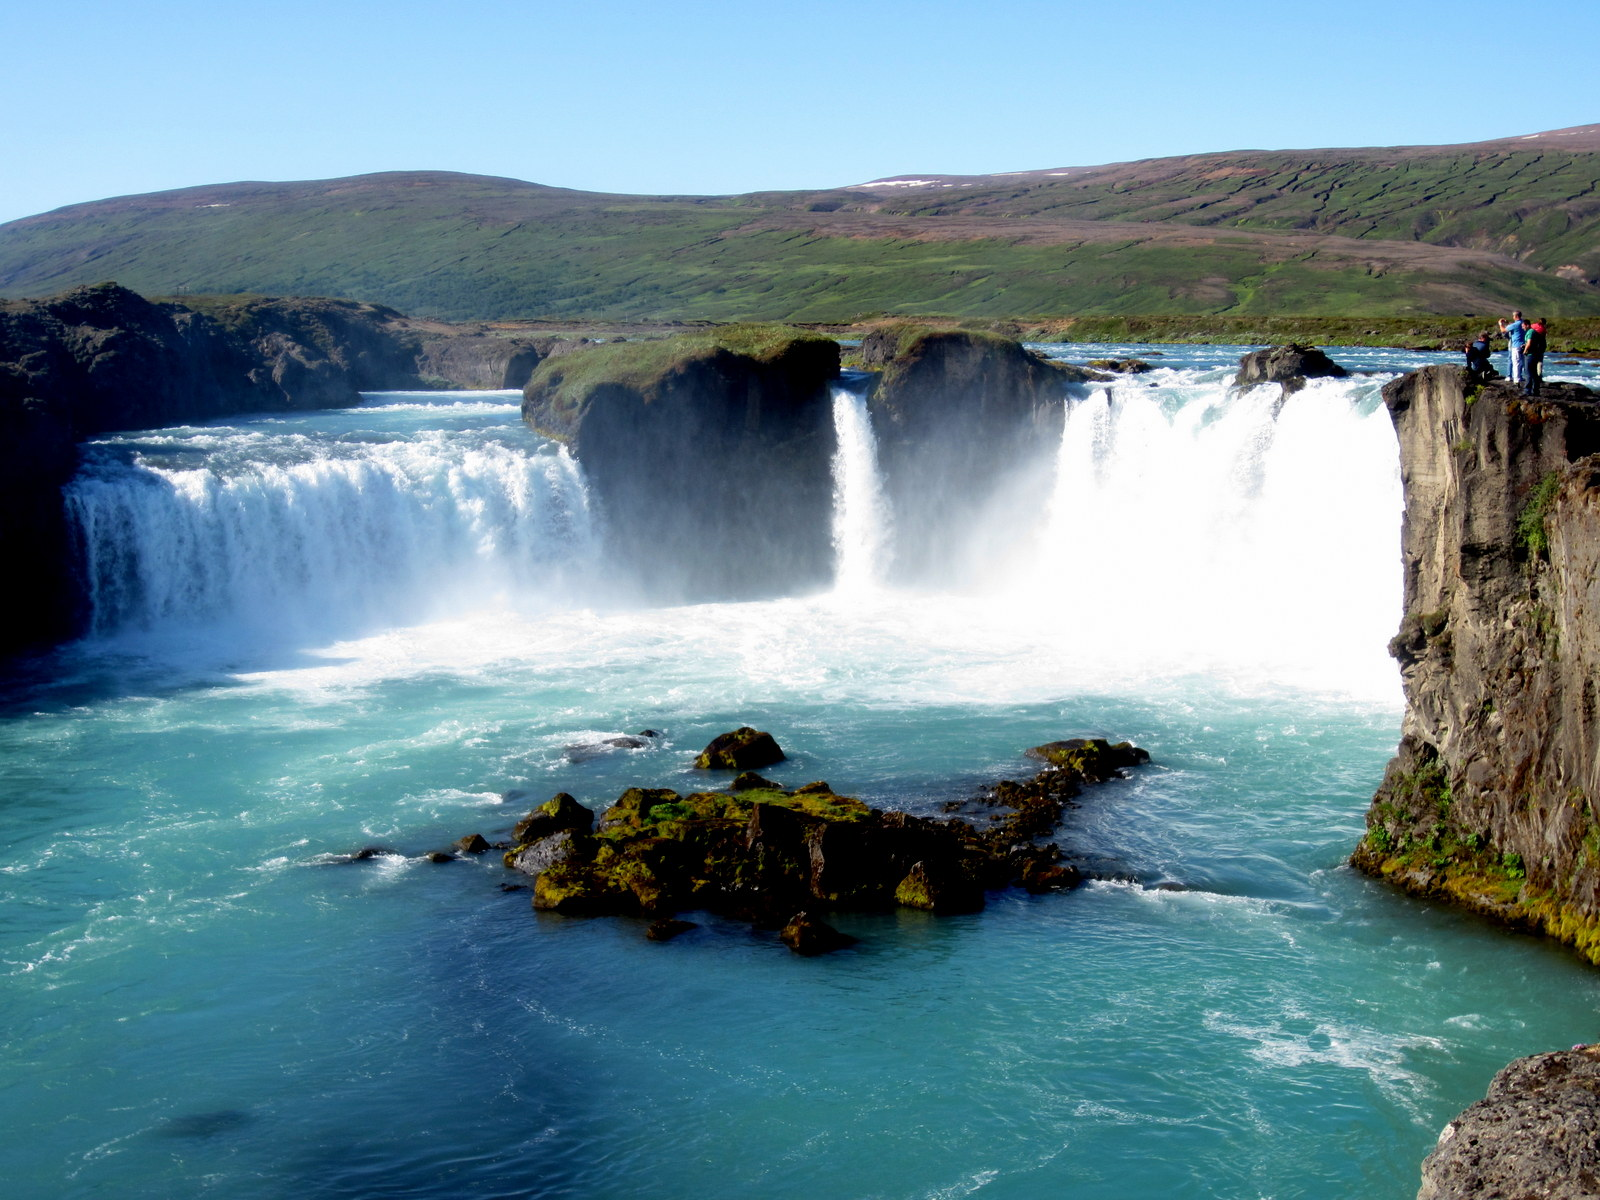 Cool Wallpapers Water Fall Waterfall Godafoss Iceland Wallpaper 1600x1200 32430